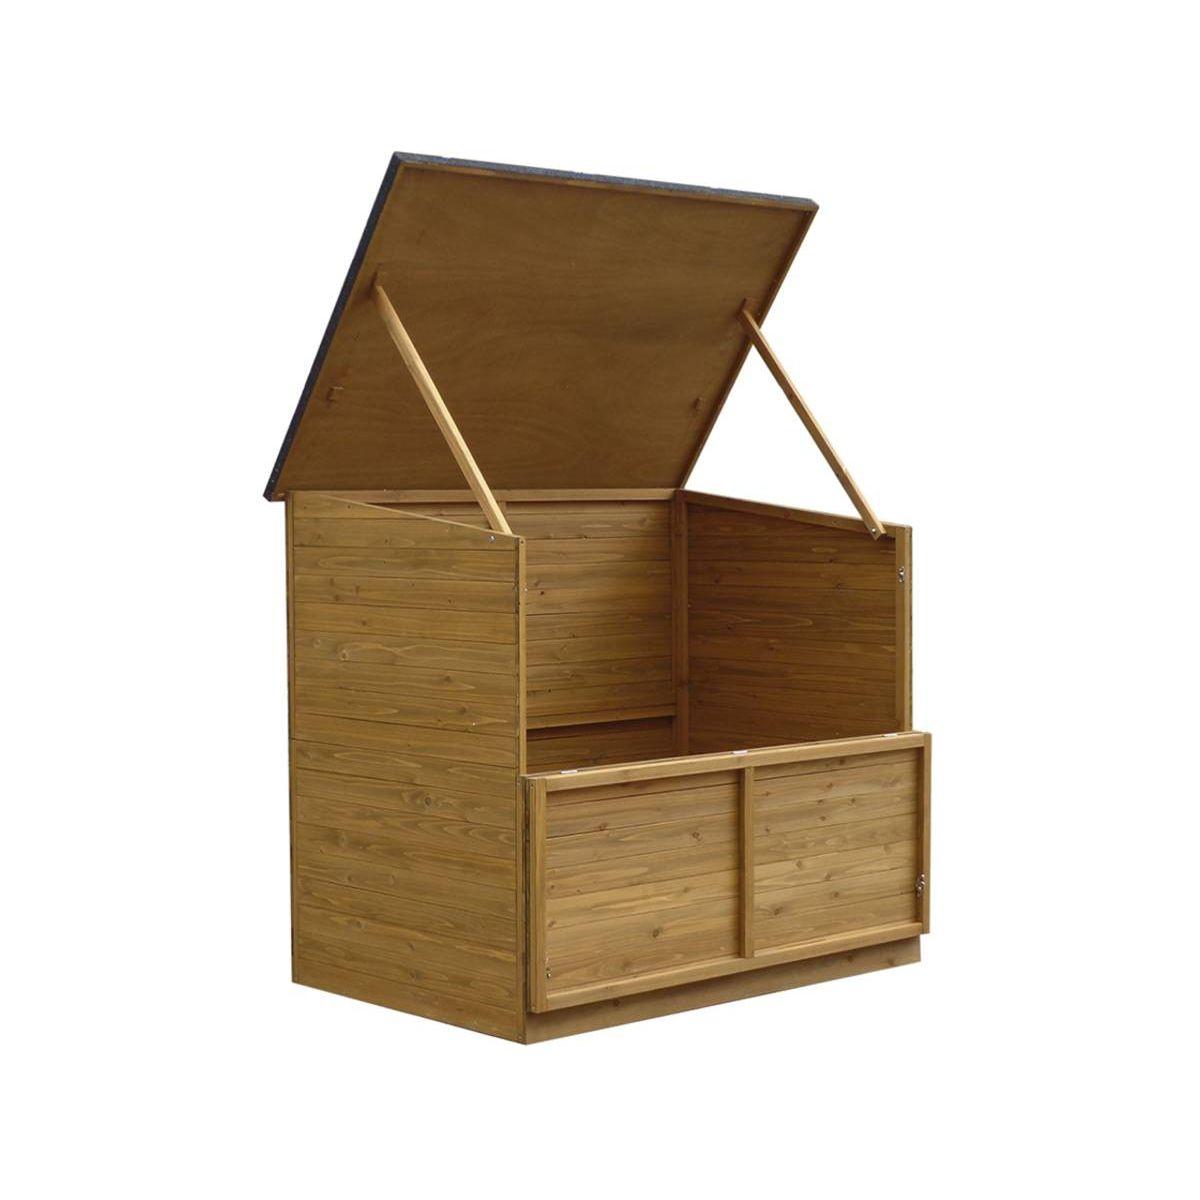 "Coffre De Jardin En Bois ""caja"" - 137 X 91 X 121 Cm - Marron ... dedans Coffre De Jardin Castorama"